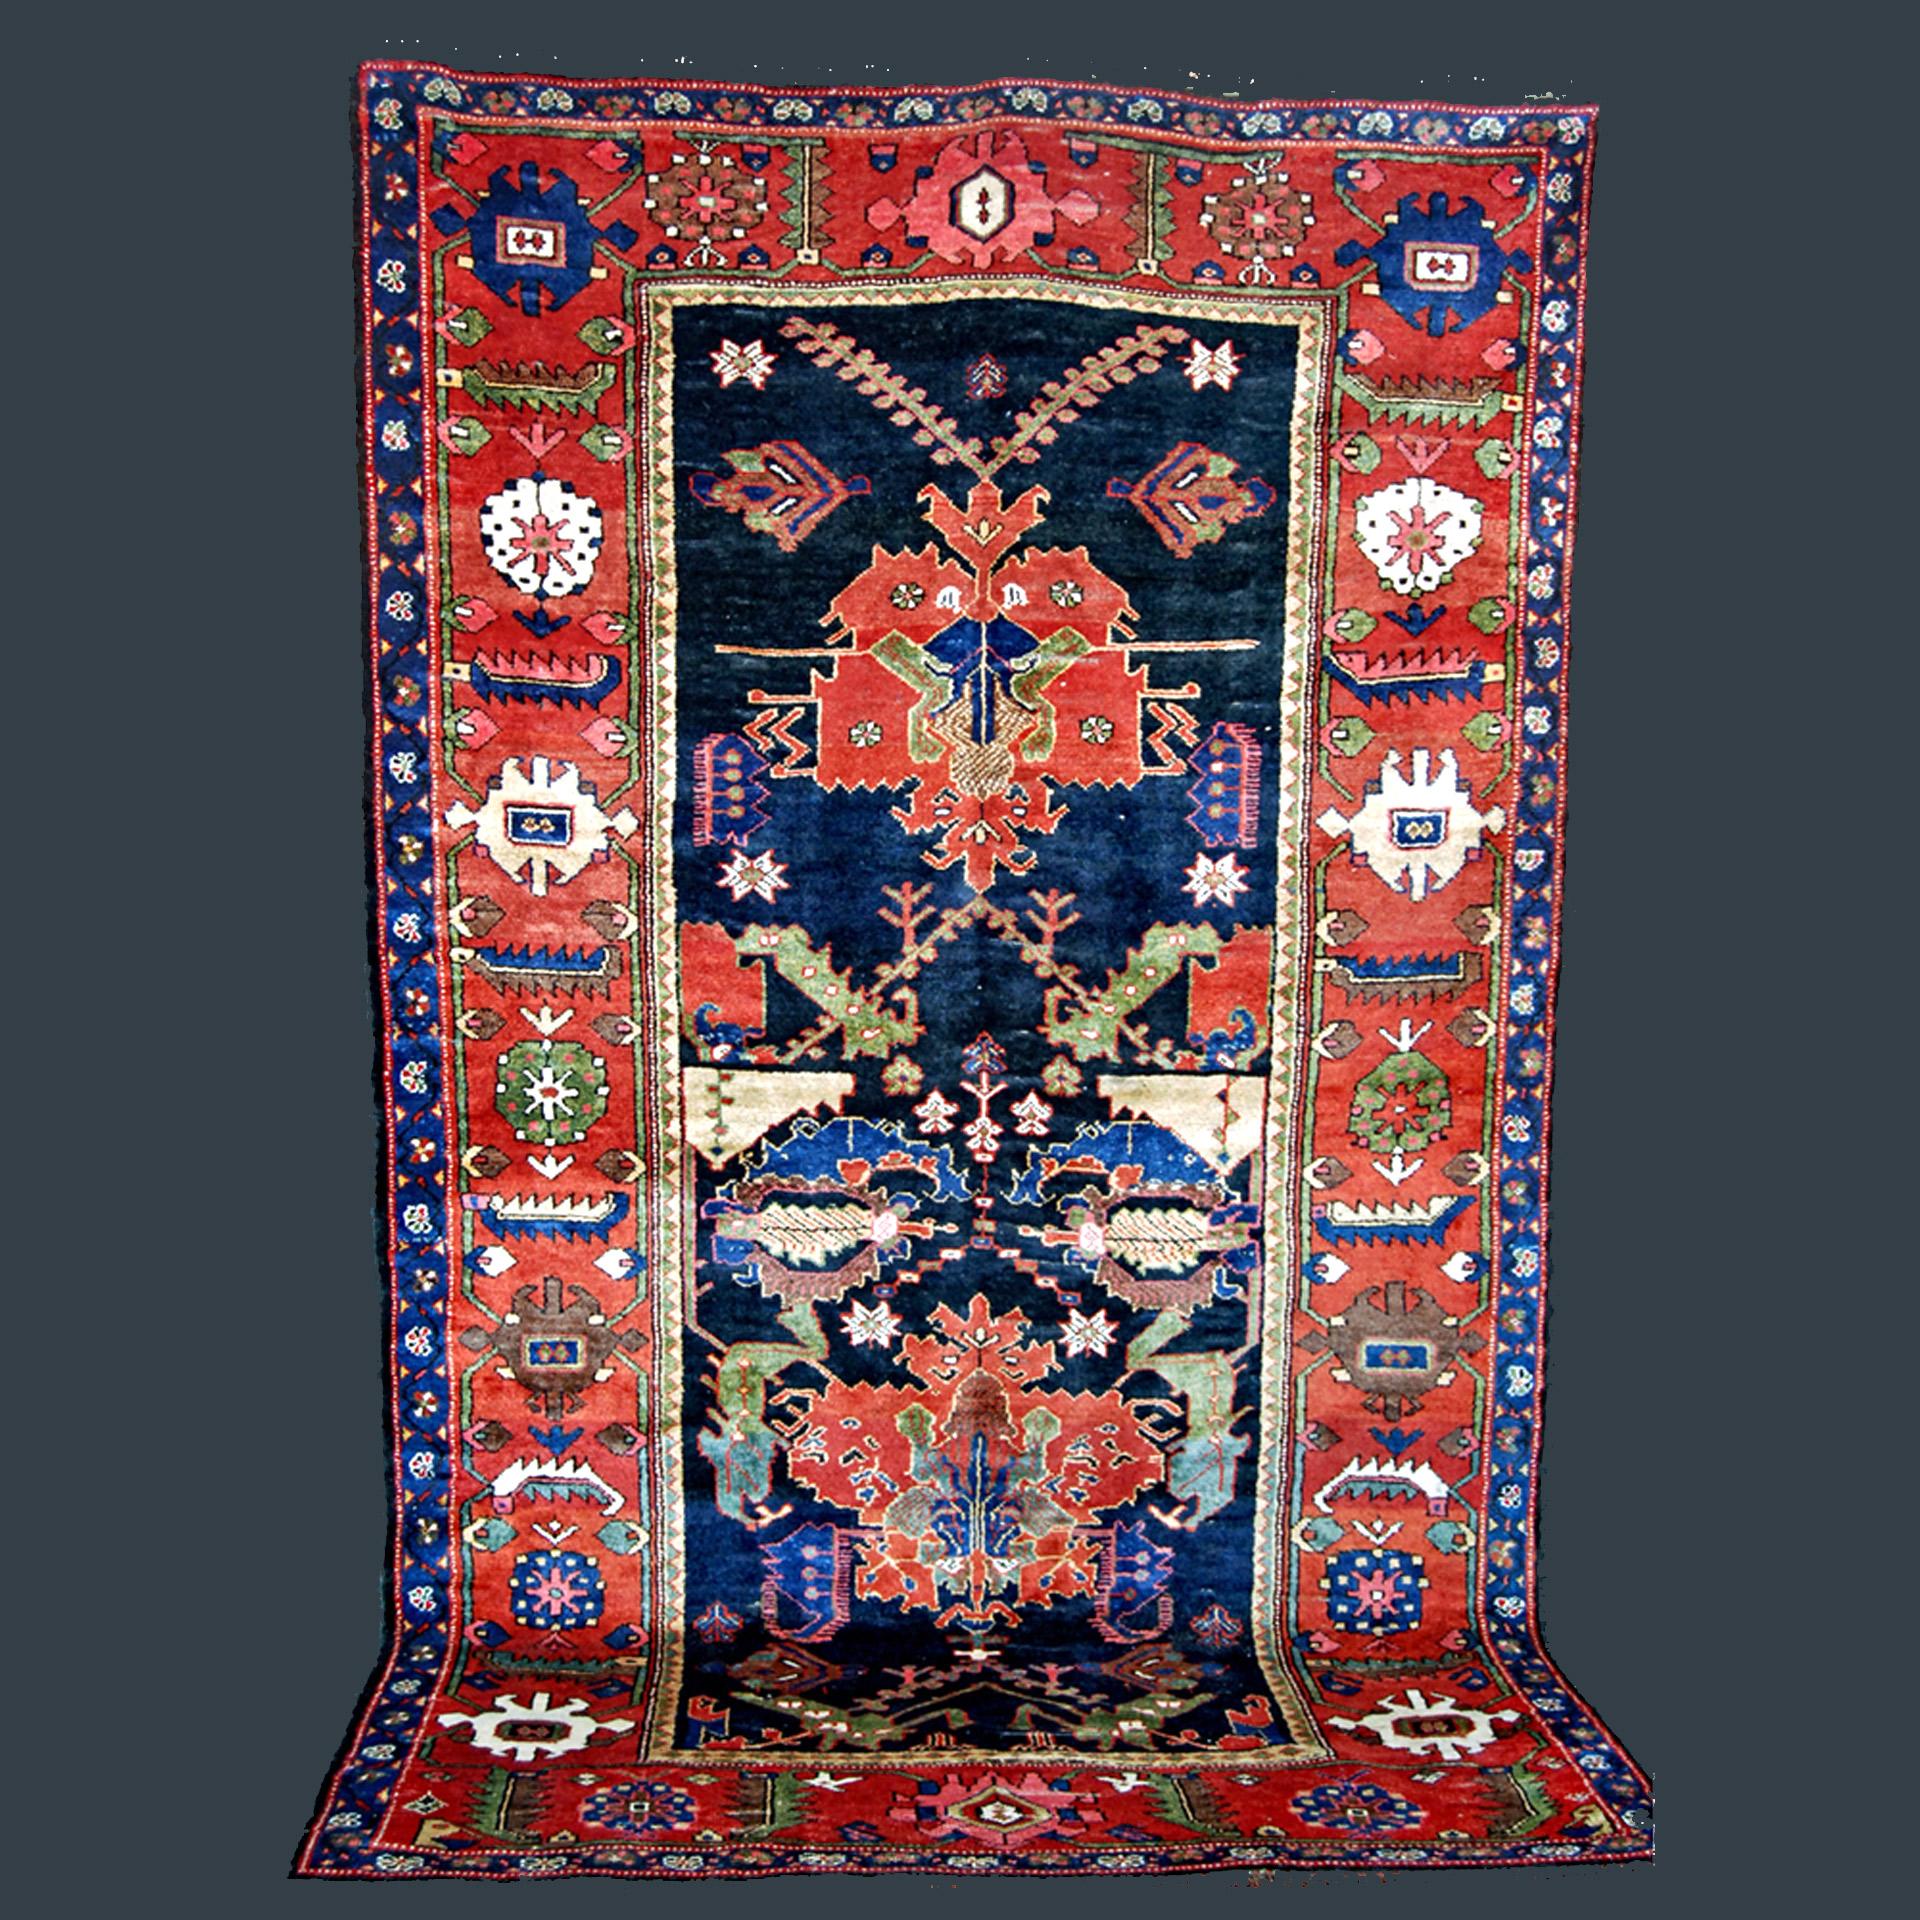 Antique south Persian Bakhtiyari carpet with Dragon Carpet design